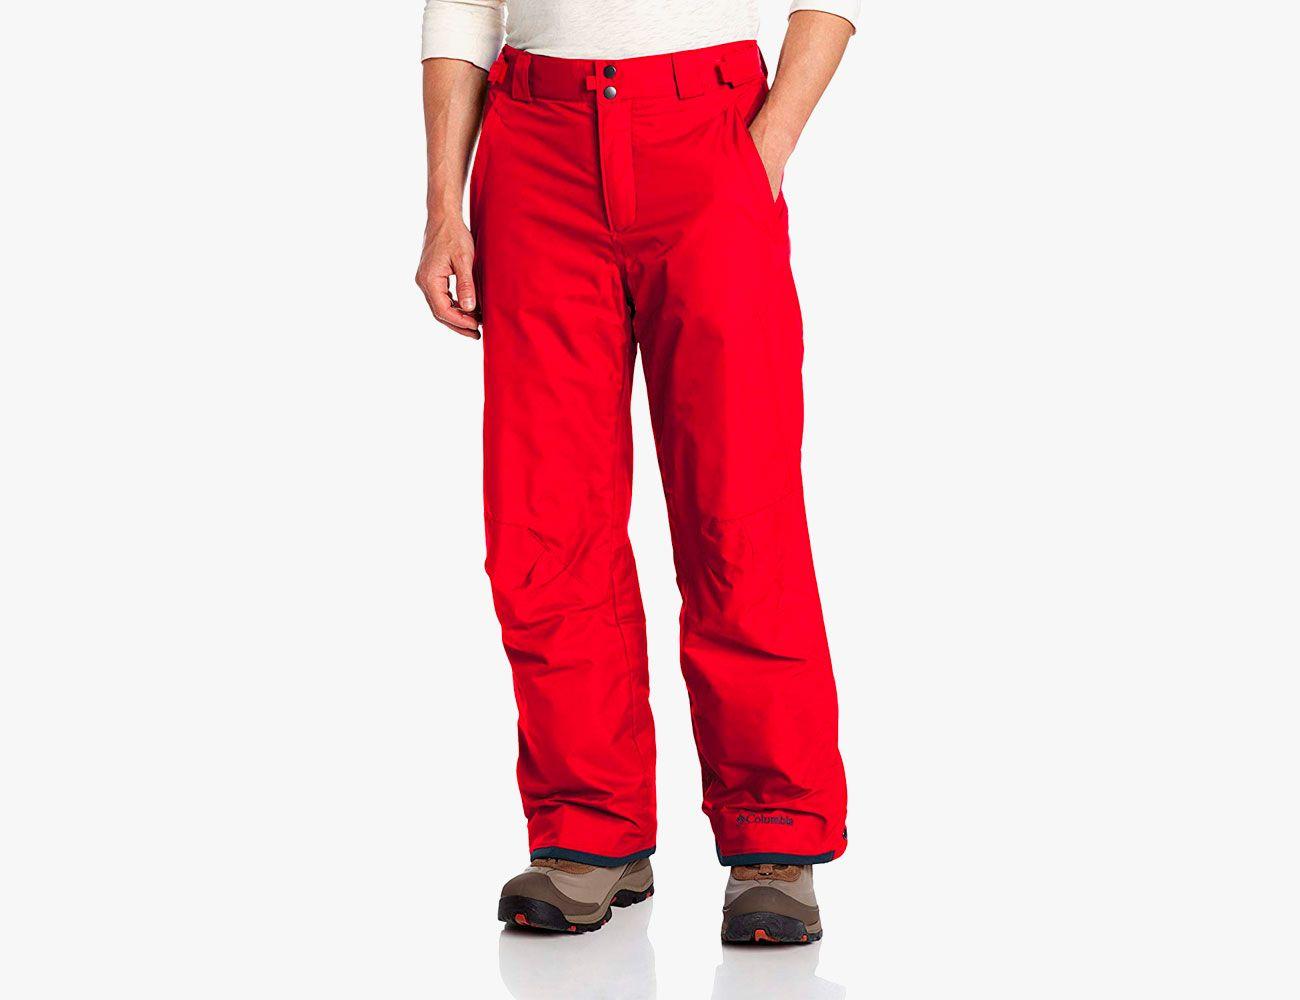 Womens Warm Outdoor Hiking Ski Pants Fleece Padded Windproof Waterproof Trousers